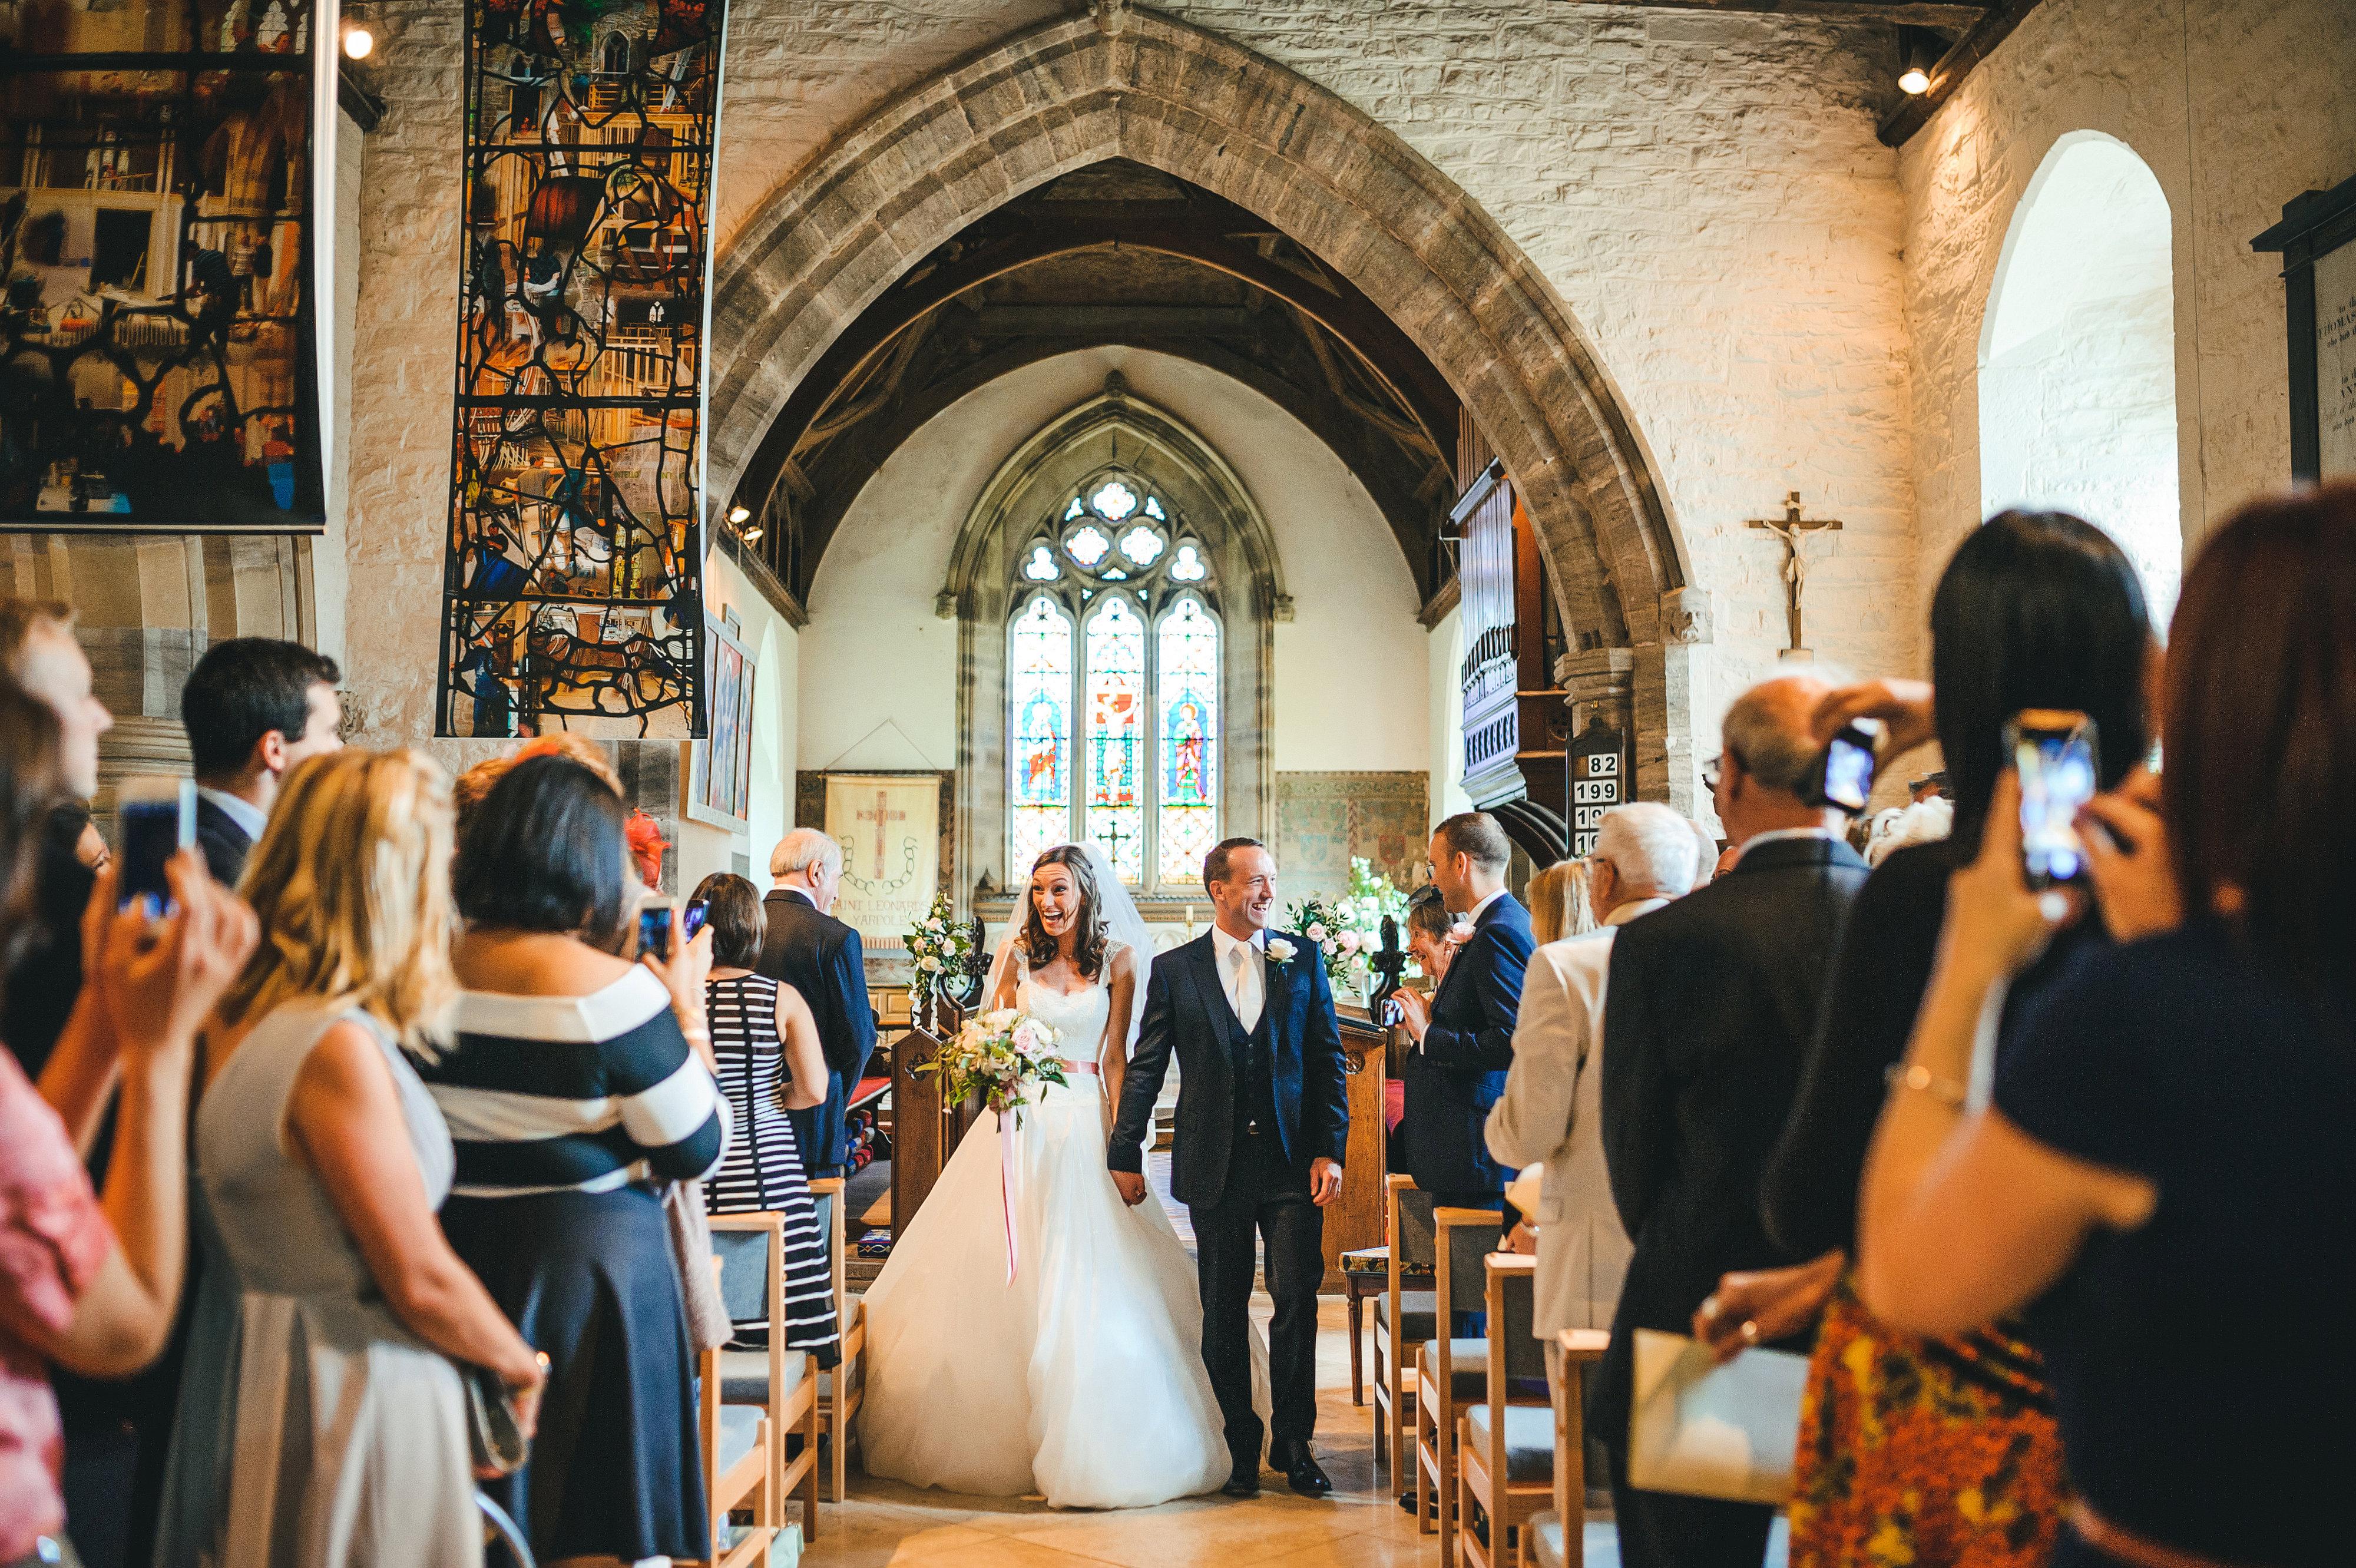 Helen & Andrew 4 designer wedding dresses by Caroline Castigliano